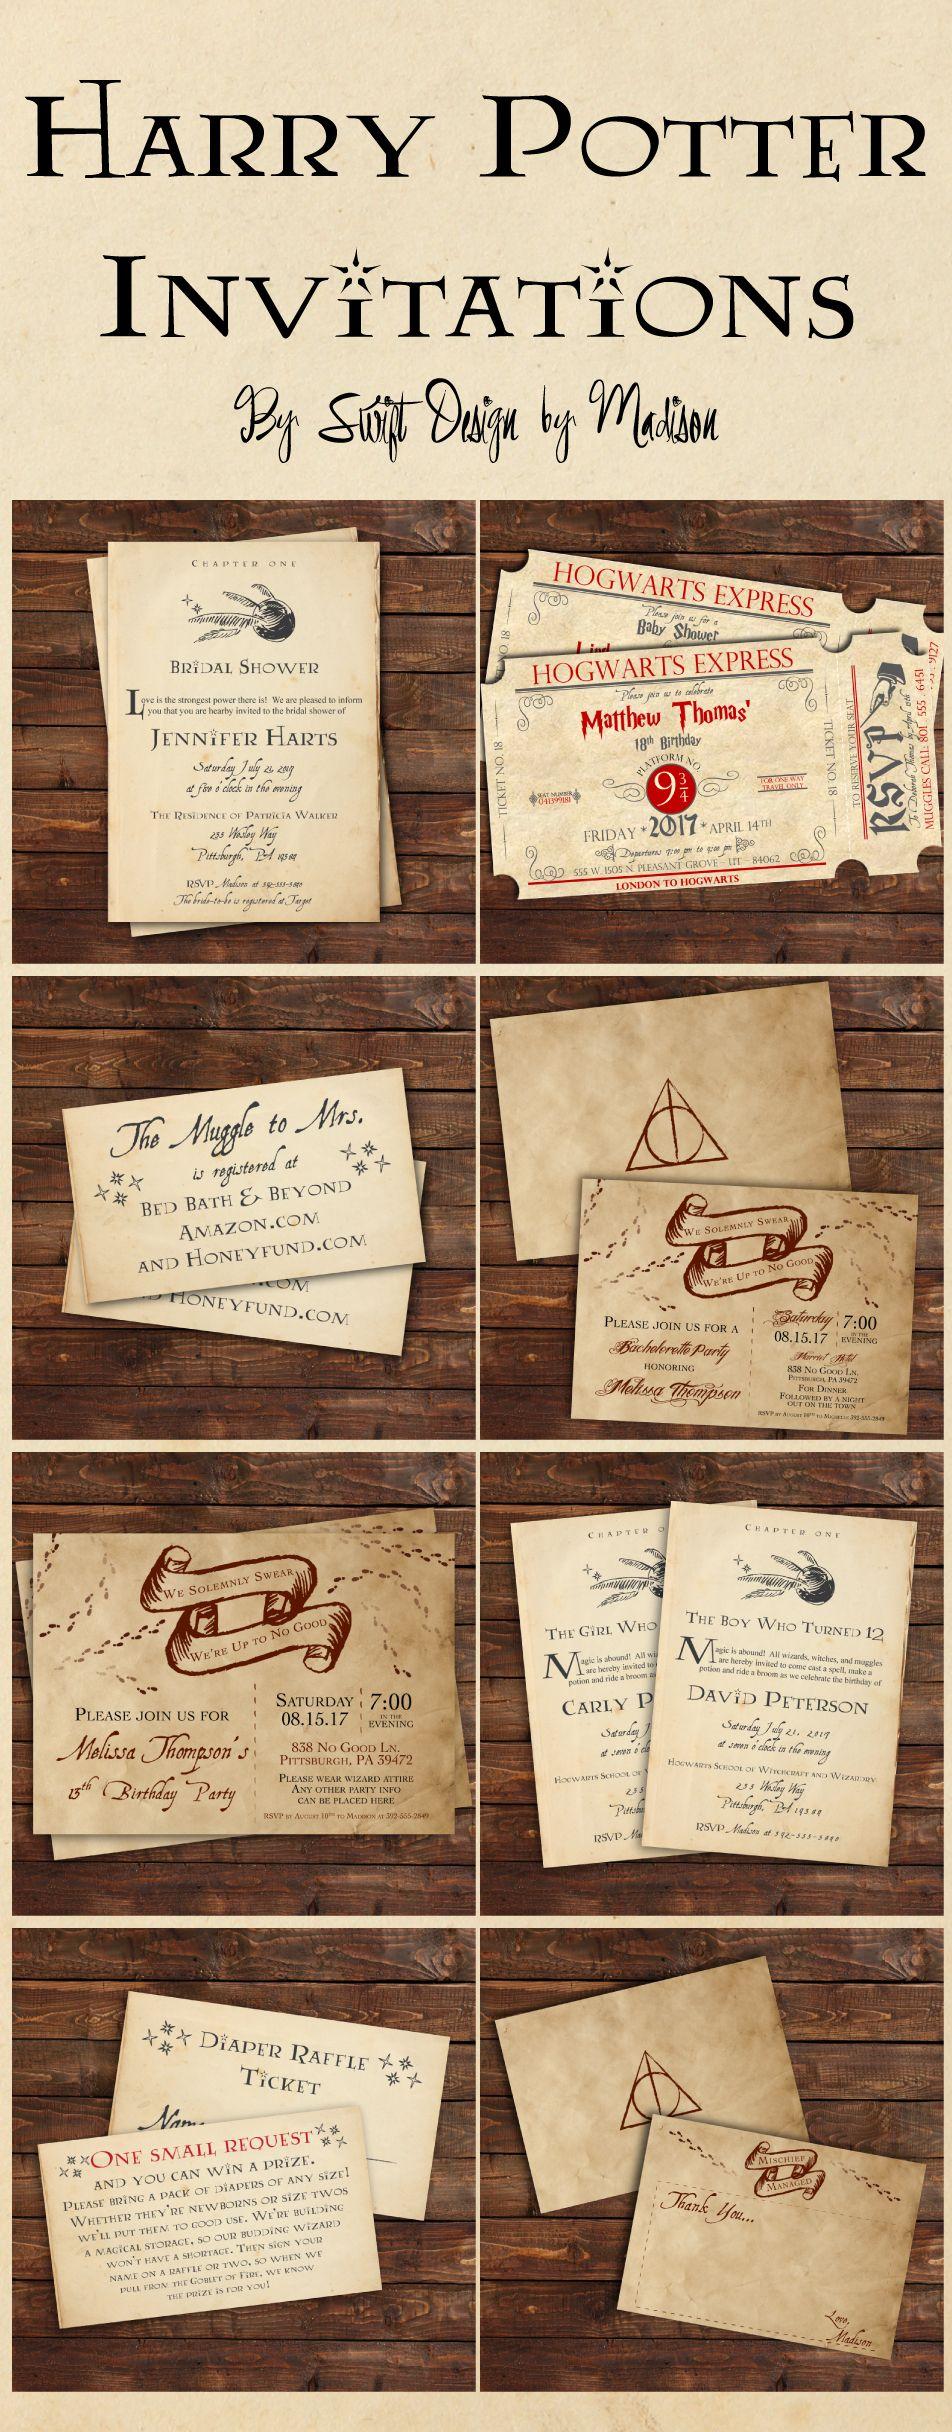 Harry Potter Inspired Invitations, Harry Potter Party, Harry Potter ...